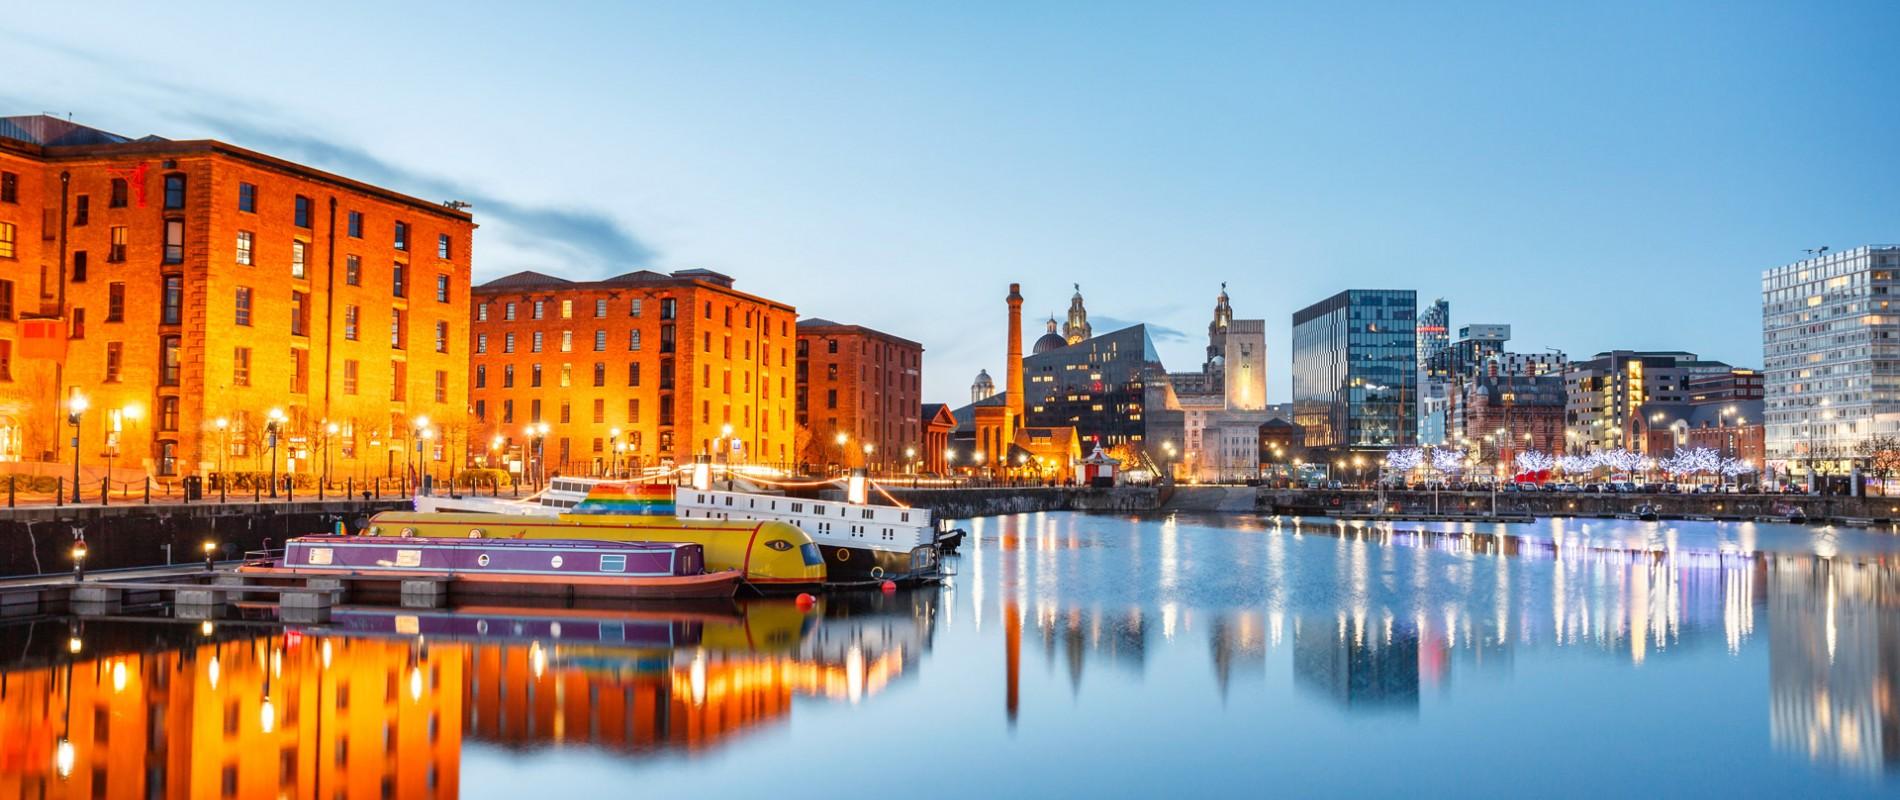 Serviced Apartments Liverpool Dream Apartments